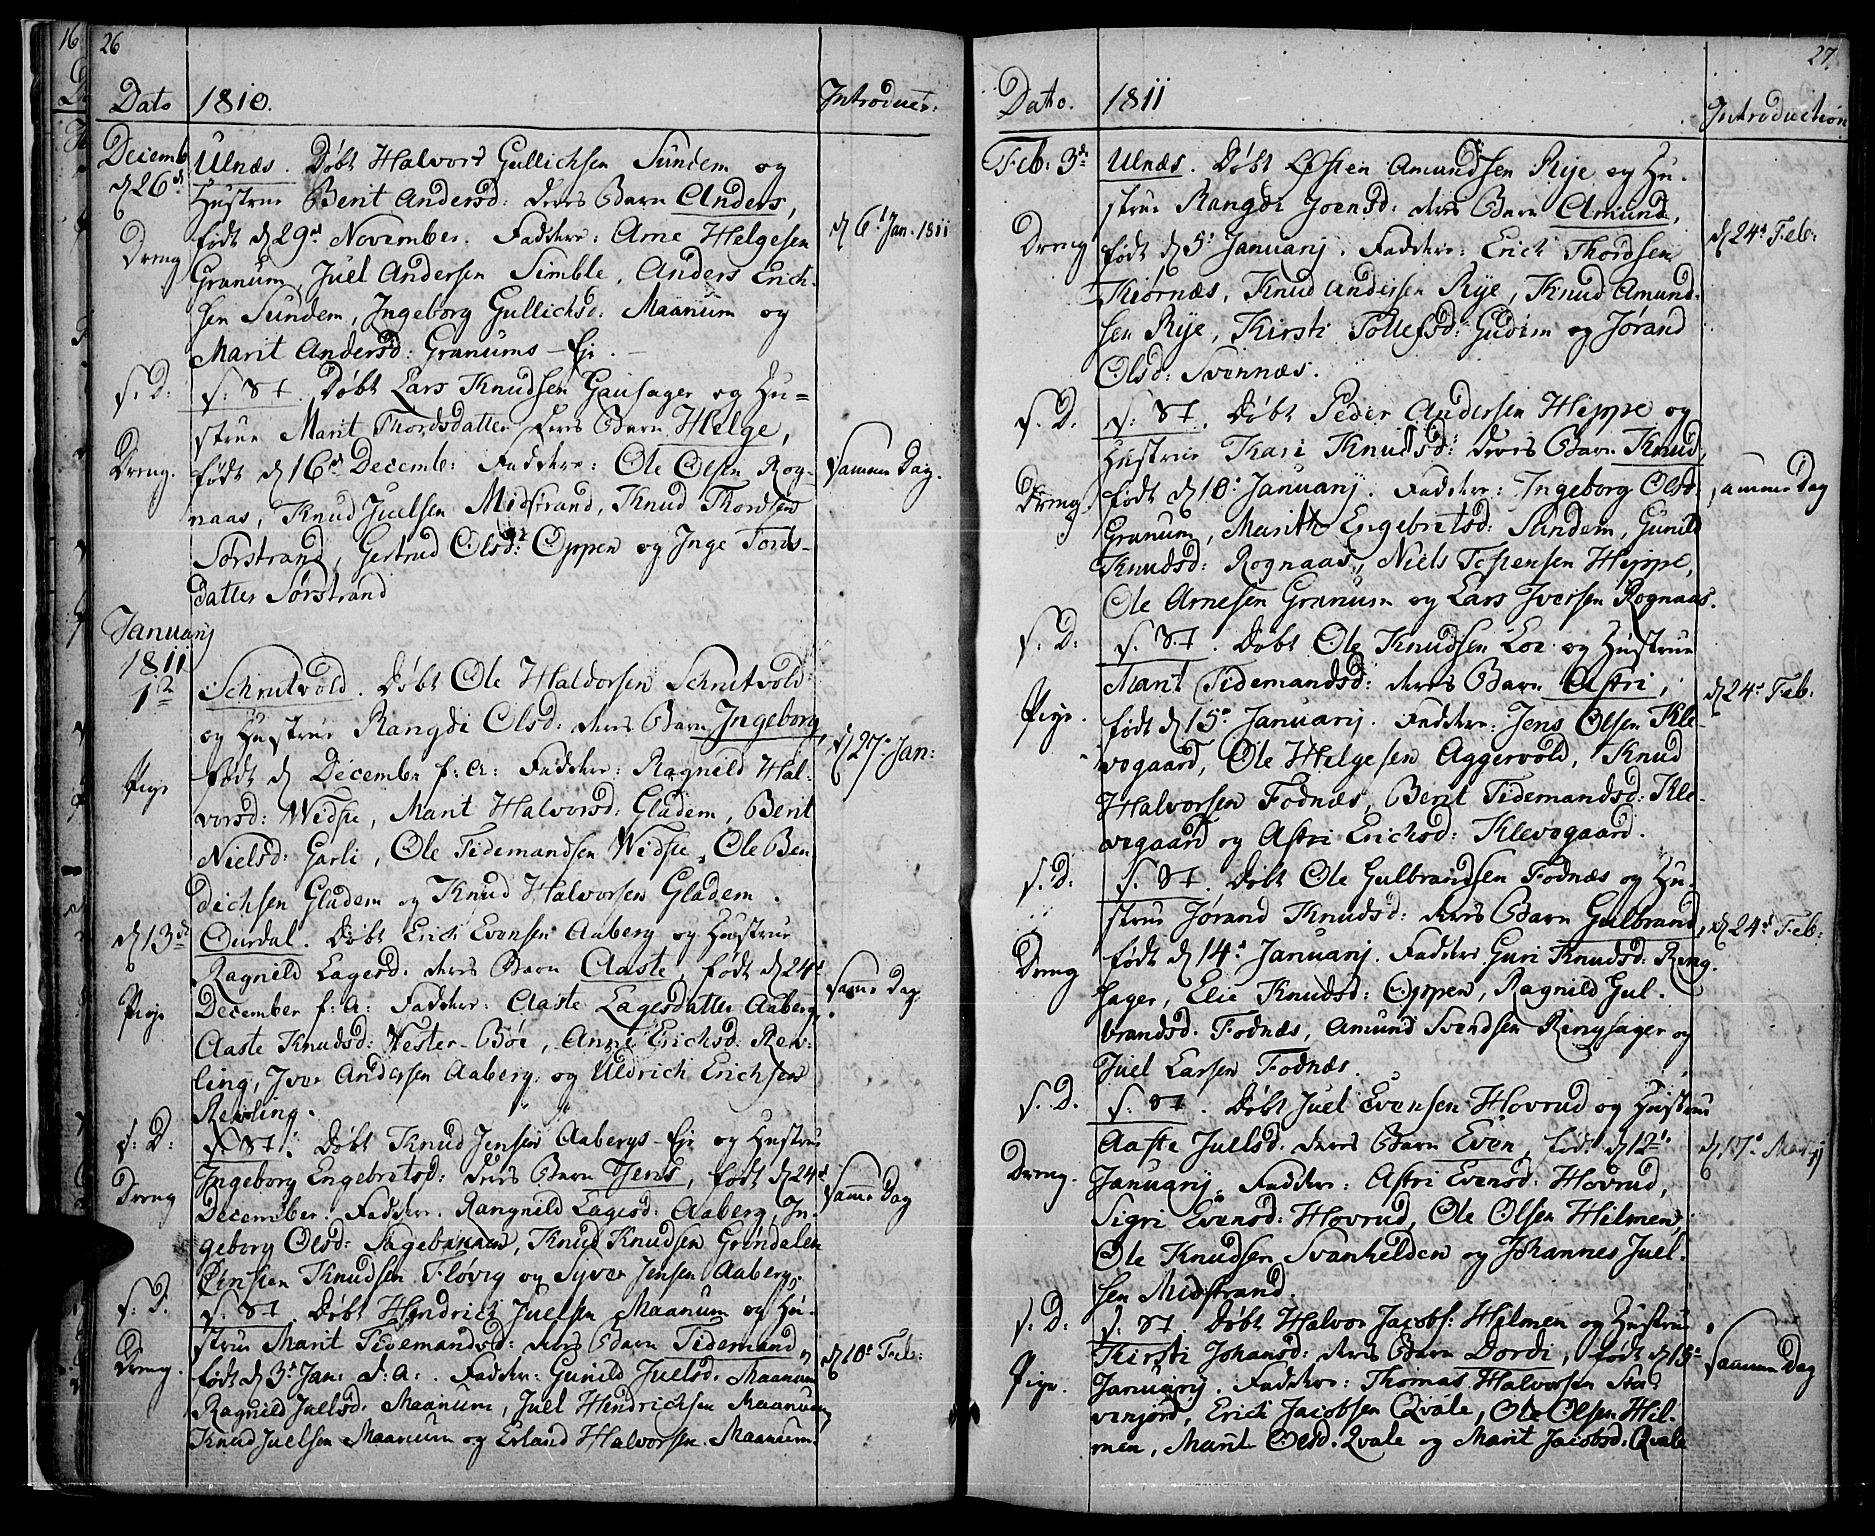 SAH, Nord-Aurdal prestekontor, Ministerialbok nr. 1, 1808-1815, s. 26-27